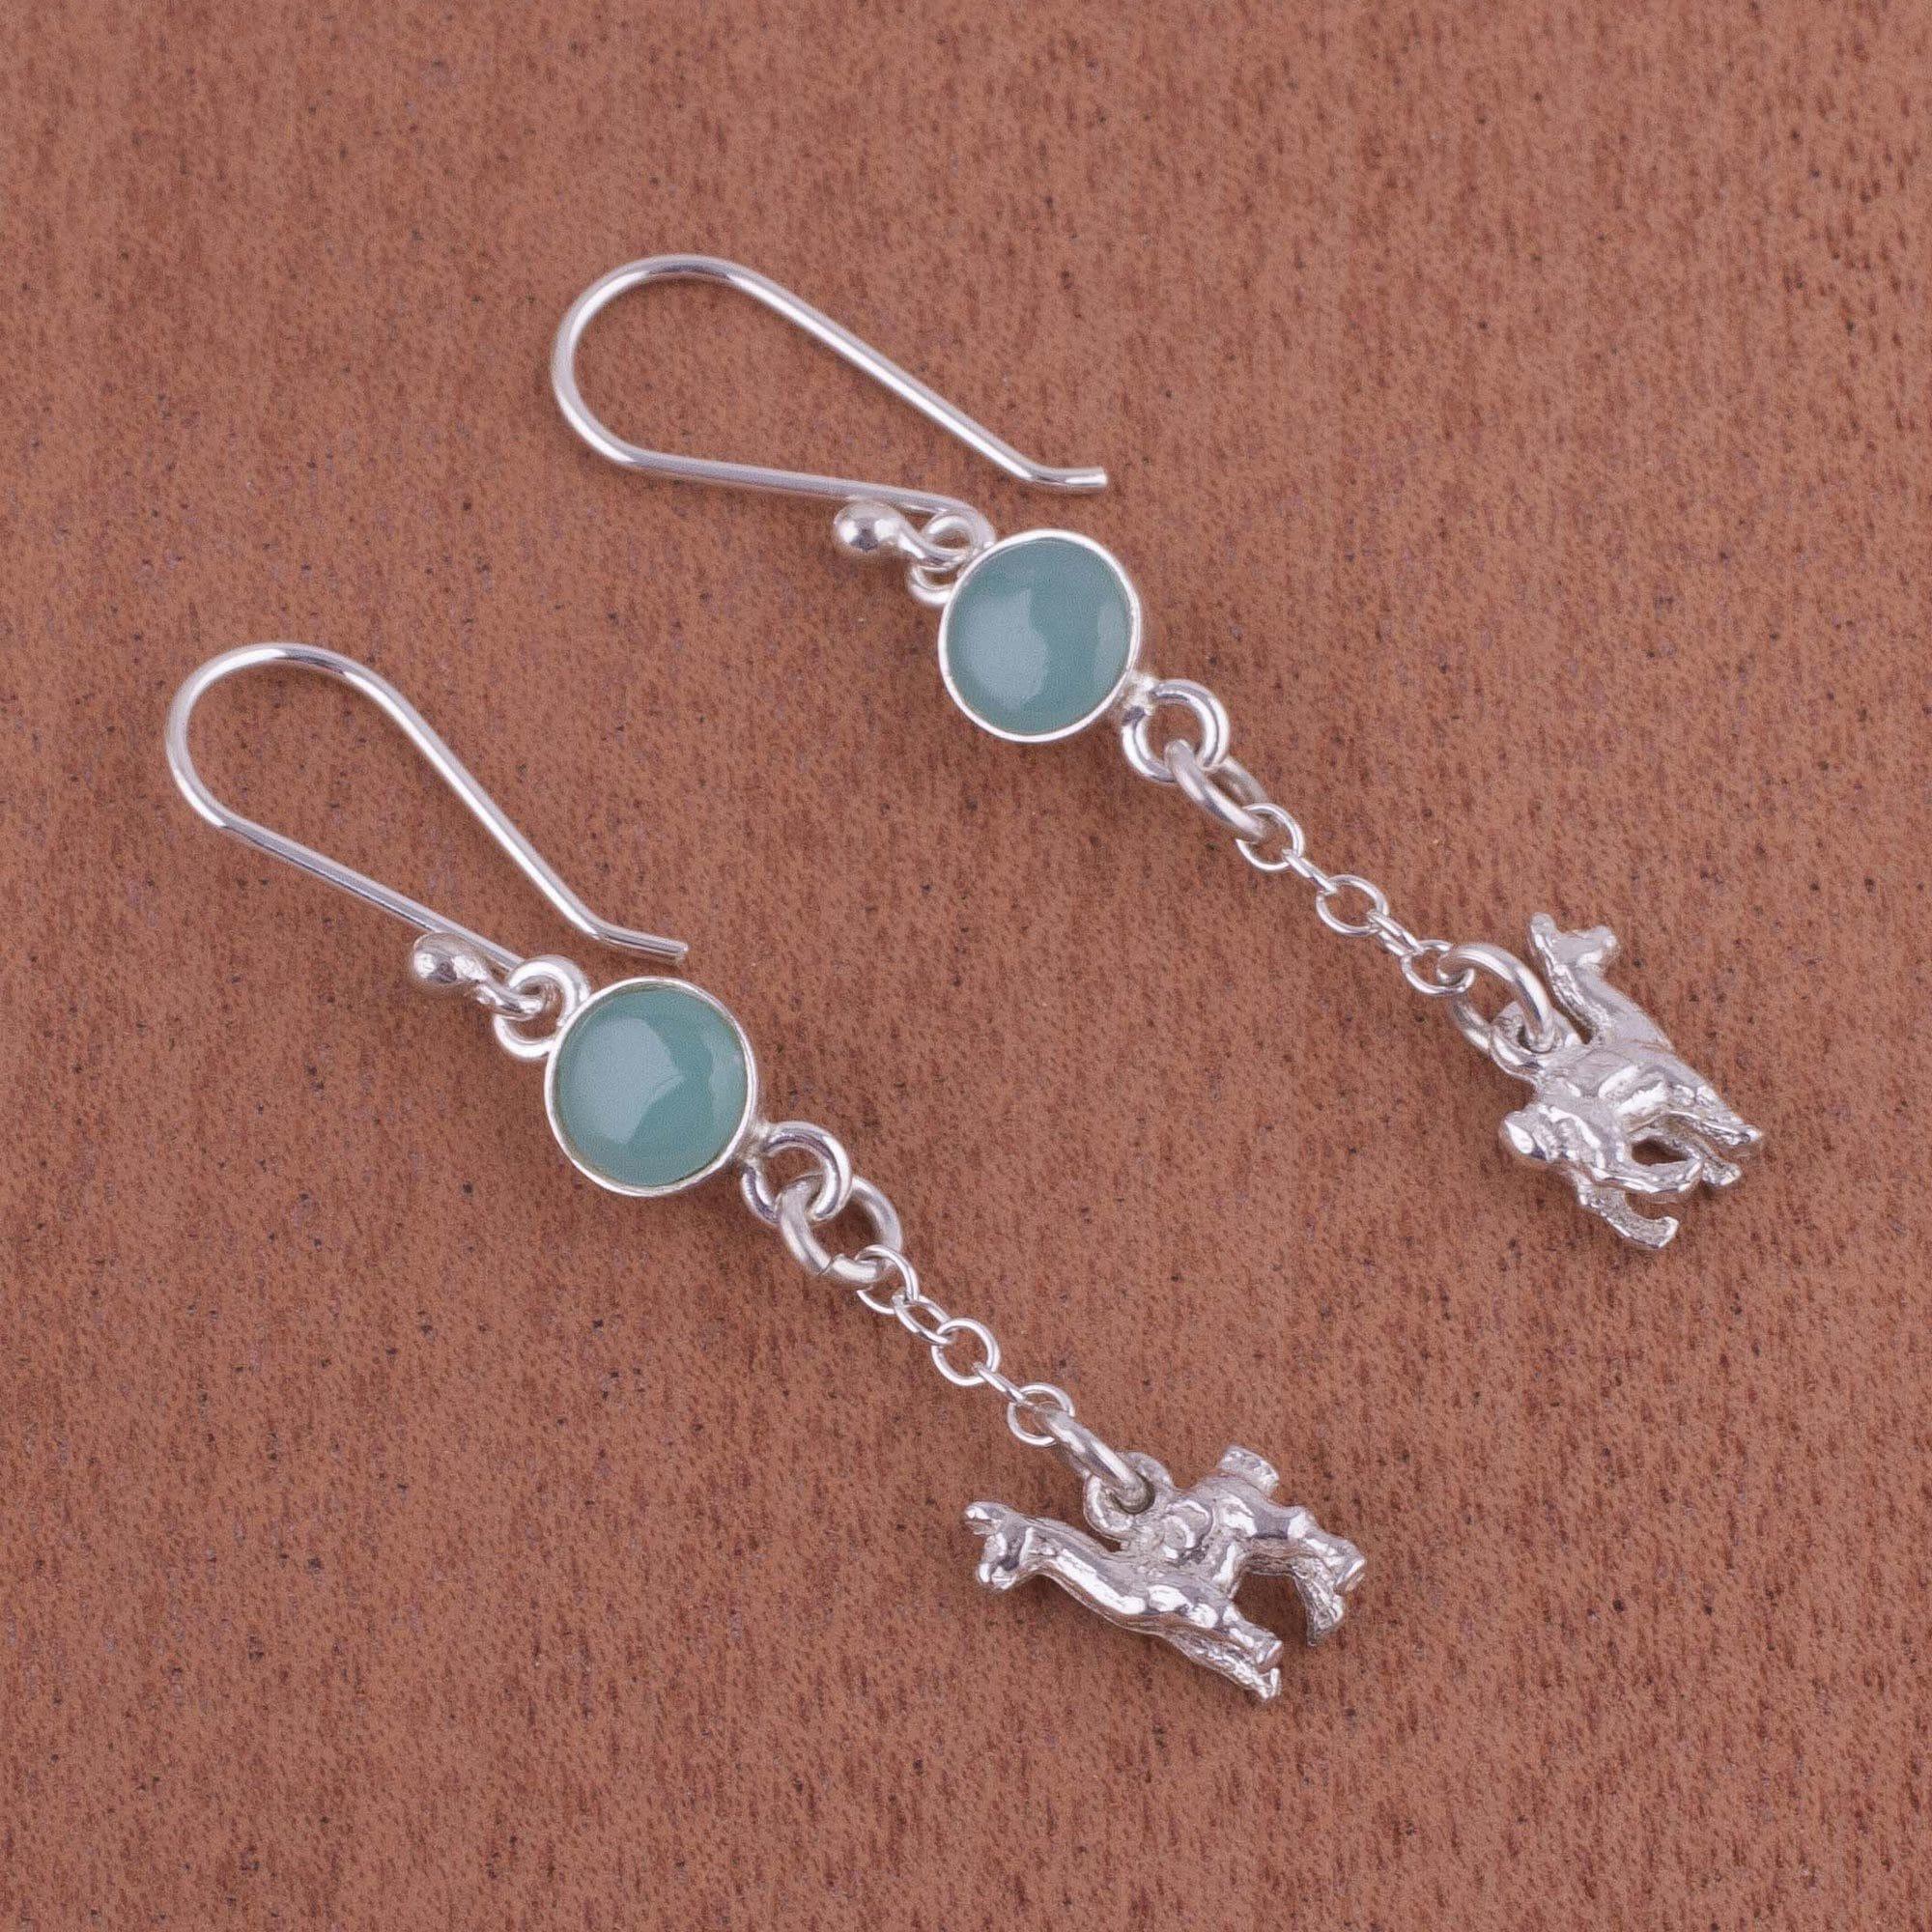 10a0b3064 Shop Handmade Sterling Silver 'Llama Light' Opal Earrings (Peru) - On Sale  - Free Shipping Today - Overstock - 14265306